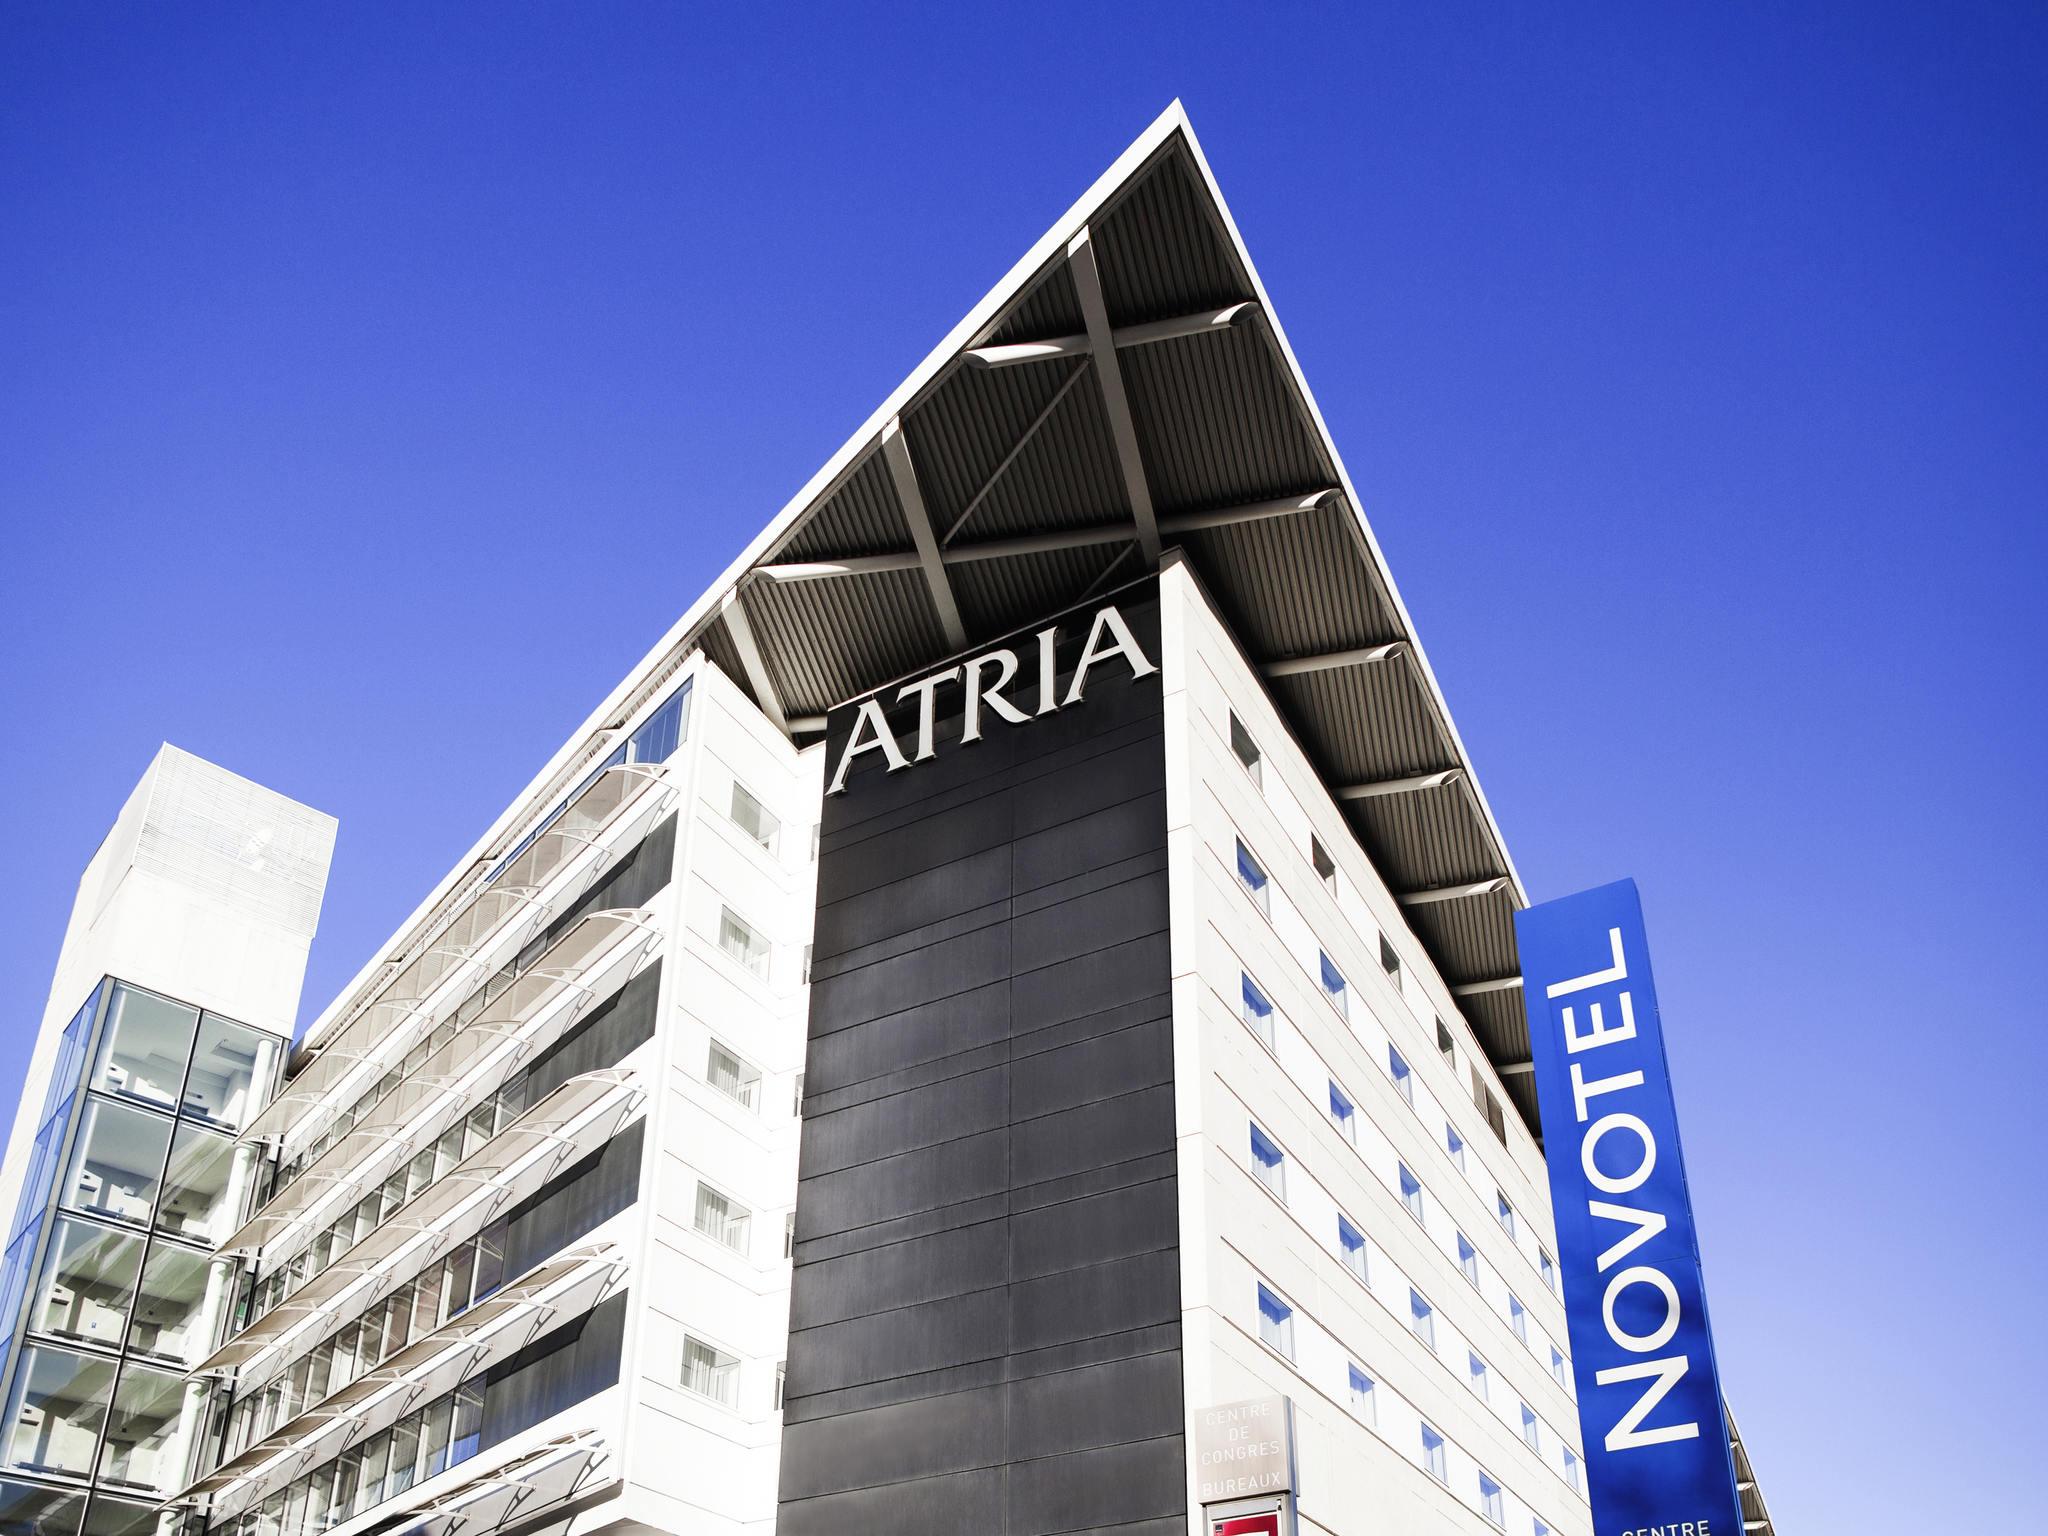 Hotel - Novotel Belfort Centre Atria